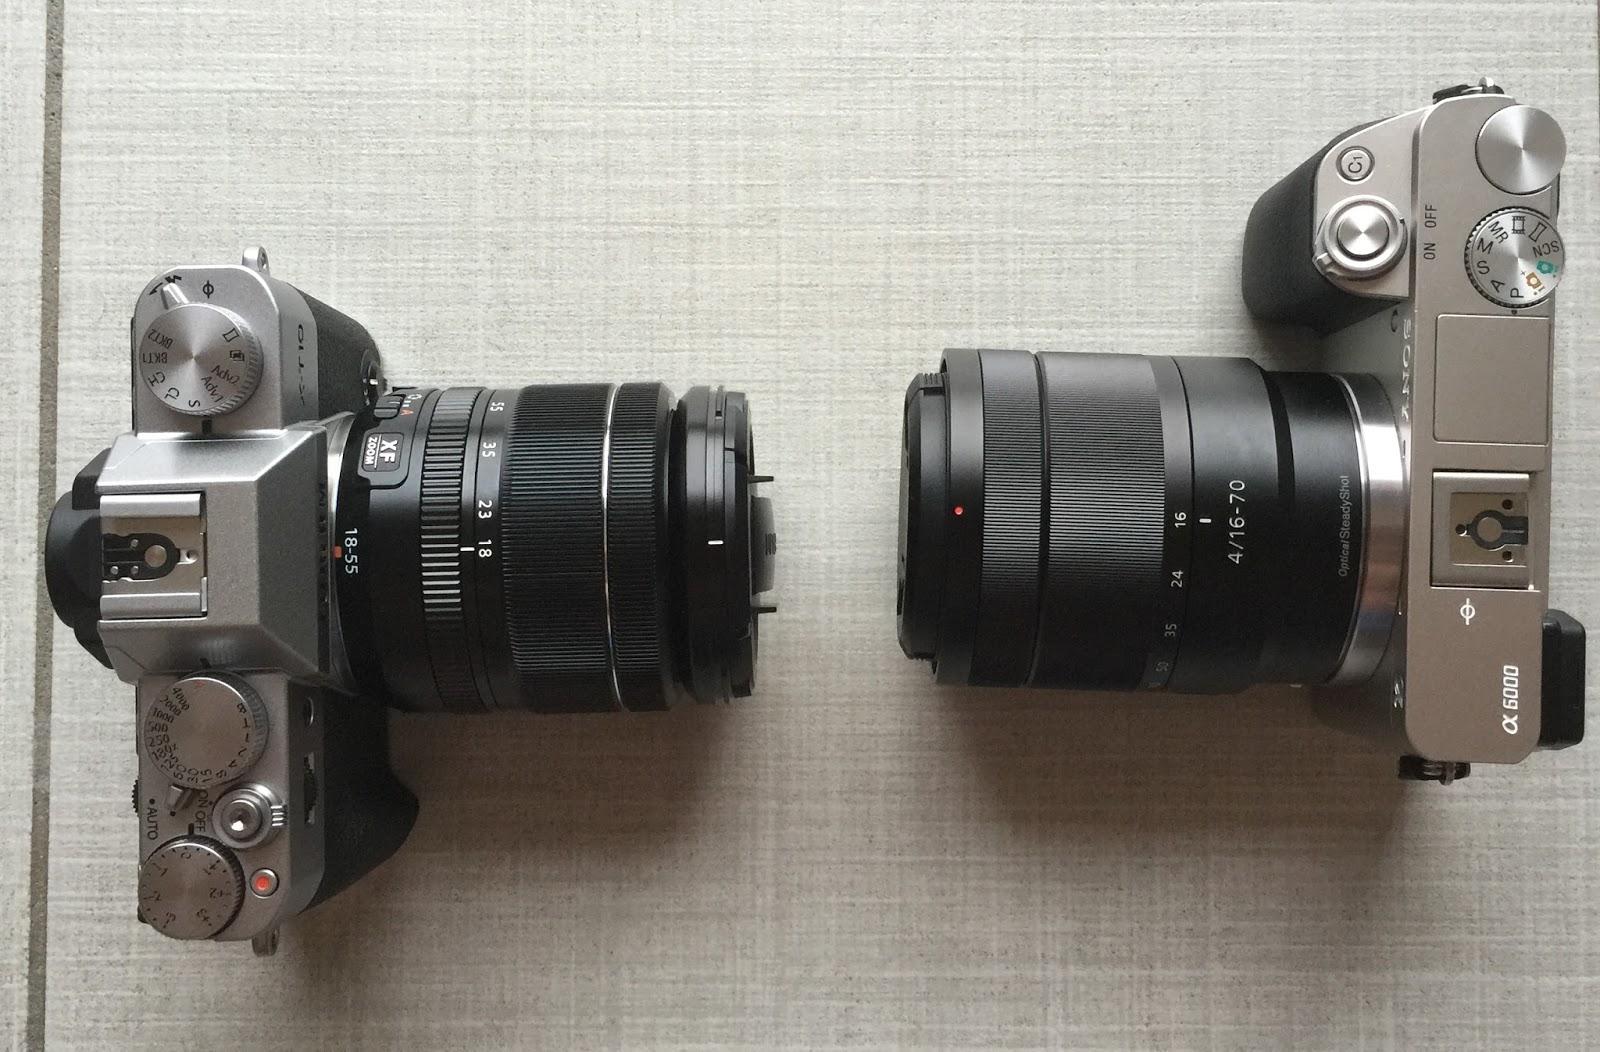 Fuji X-T10 review | Eugene Fratkin Photo Blog